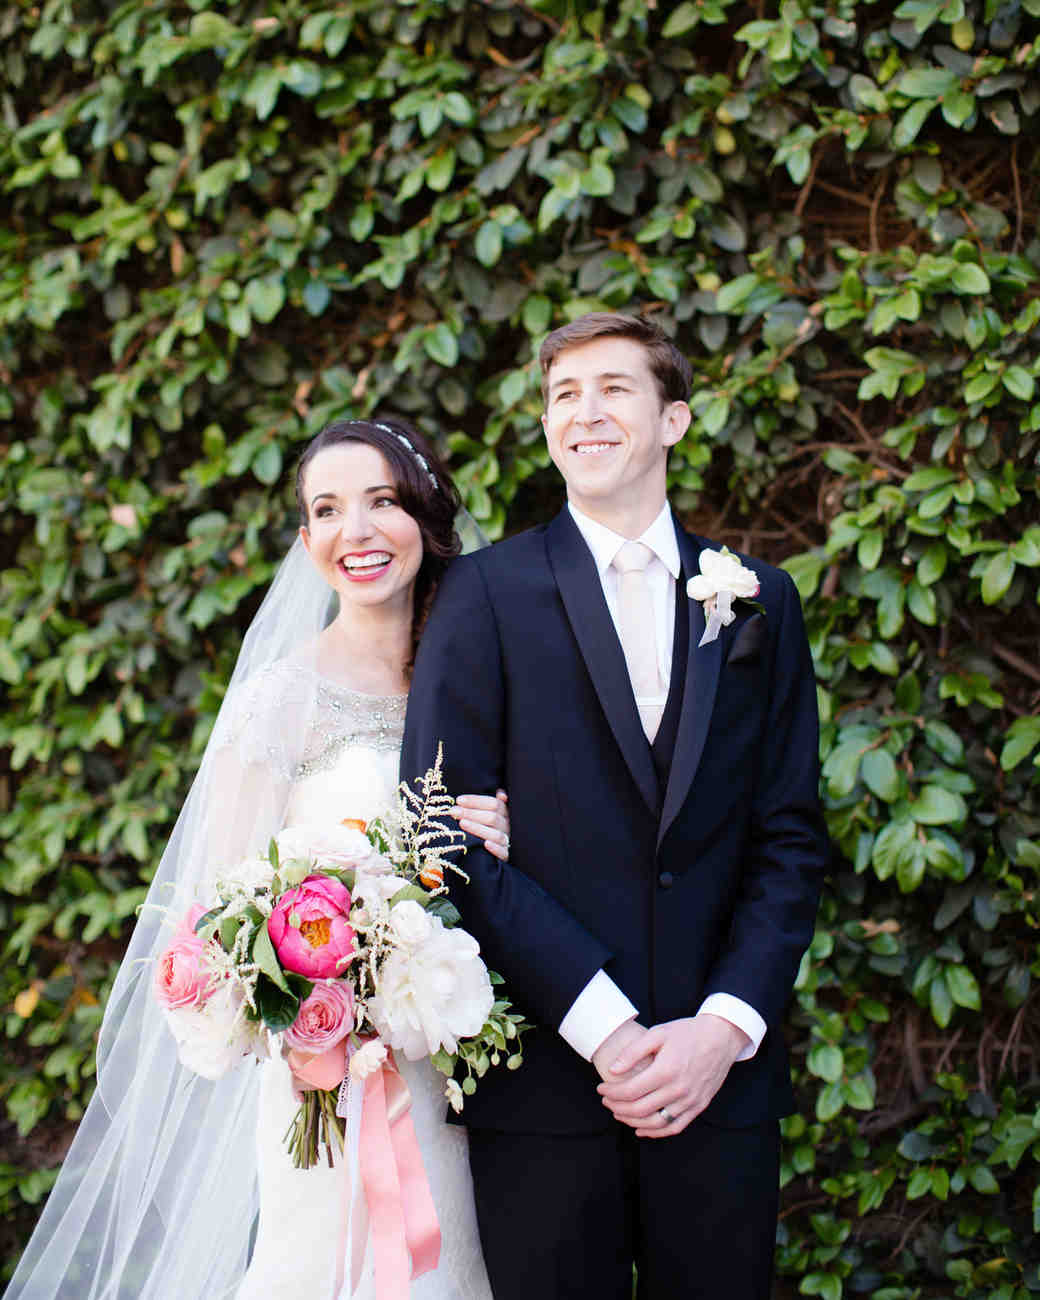 richelle-tom-wedding-couple-394-s112855-0416.jpg